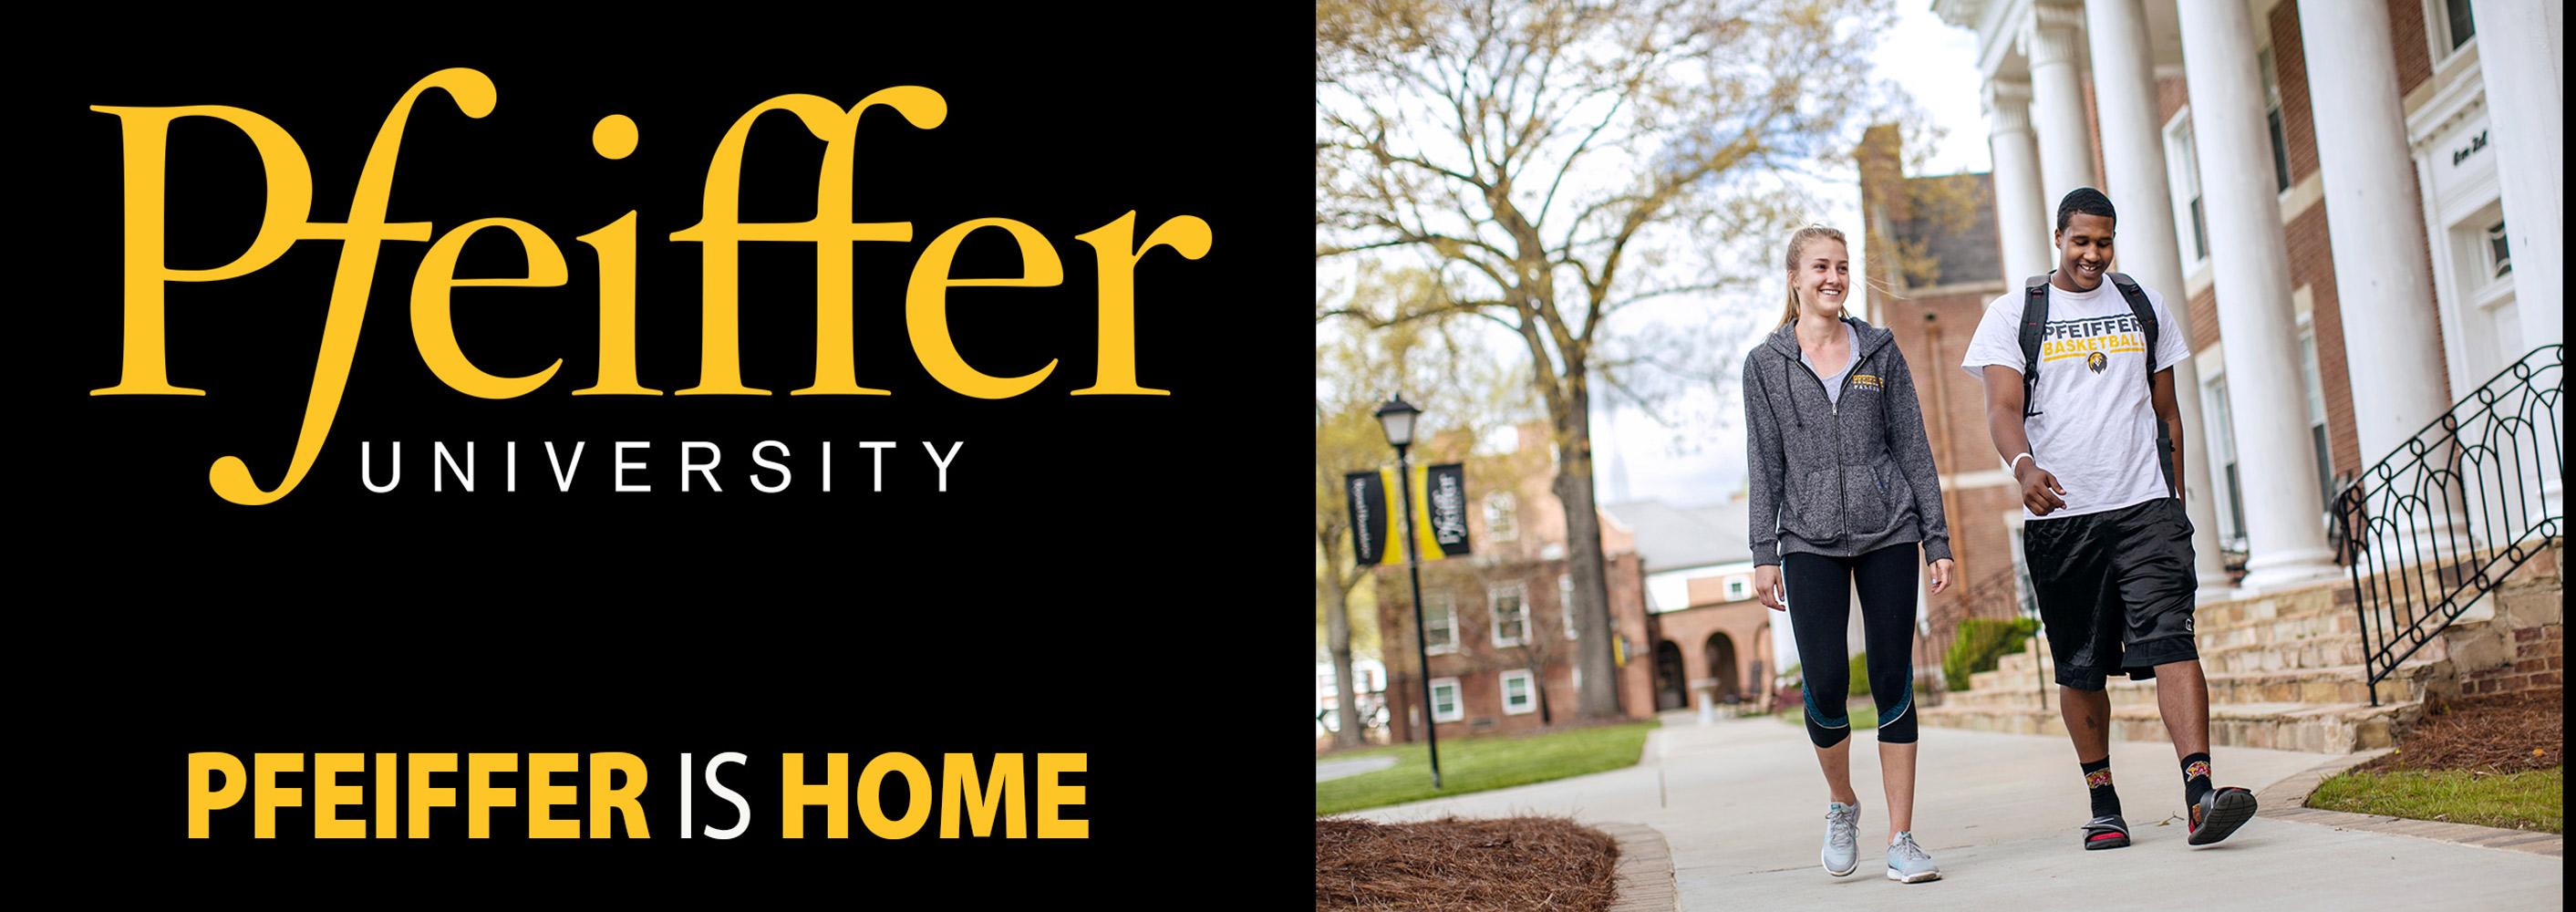 Pfeiffer University: Pfeiffer is Home